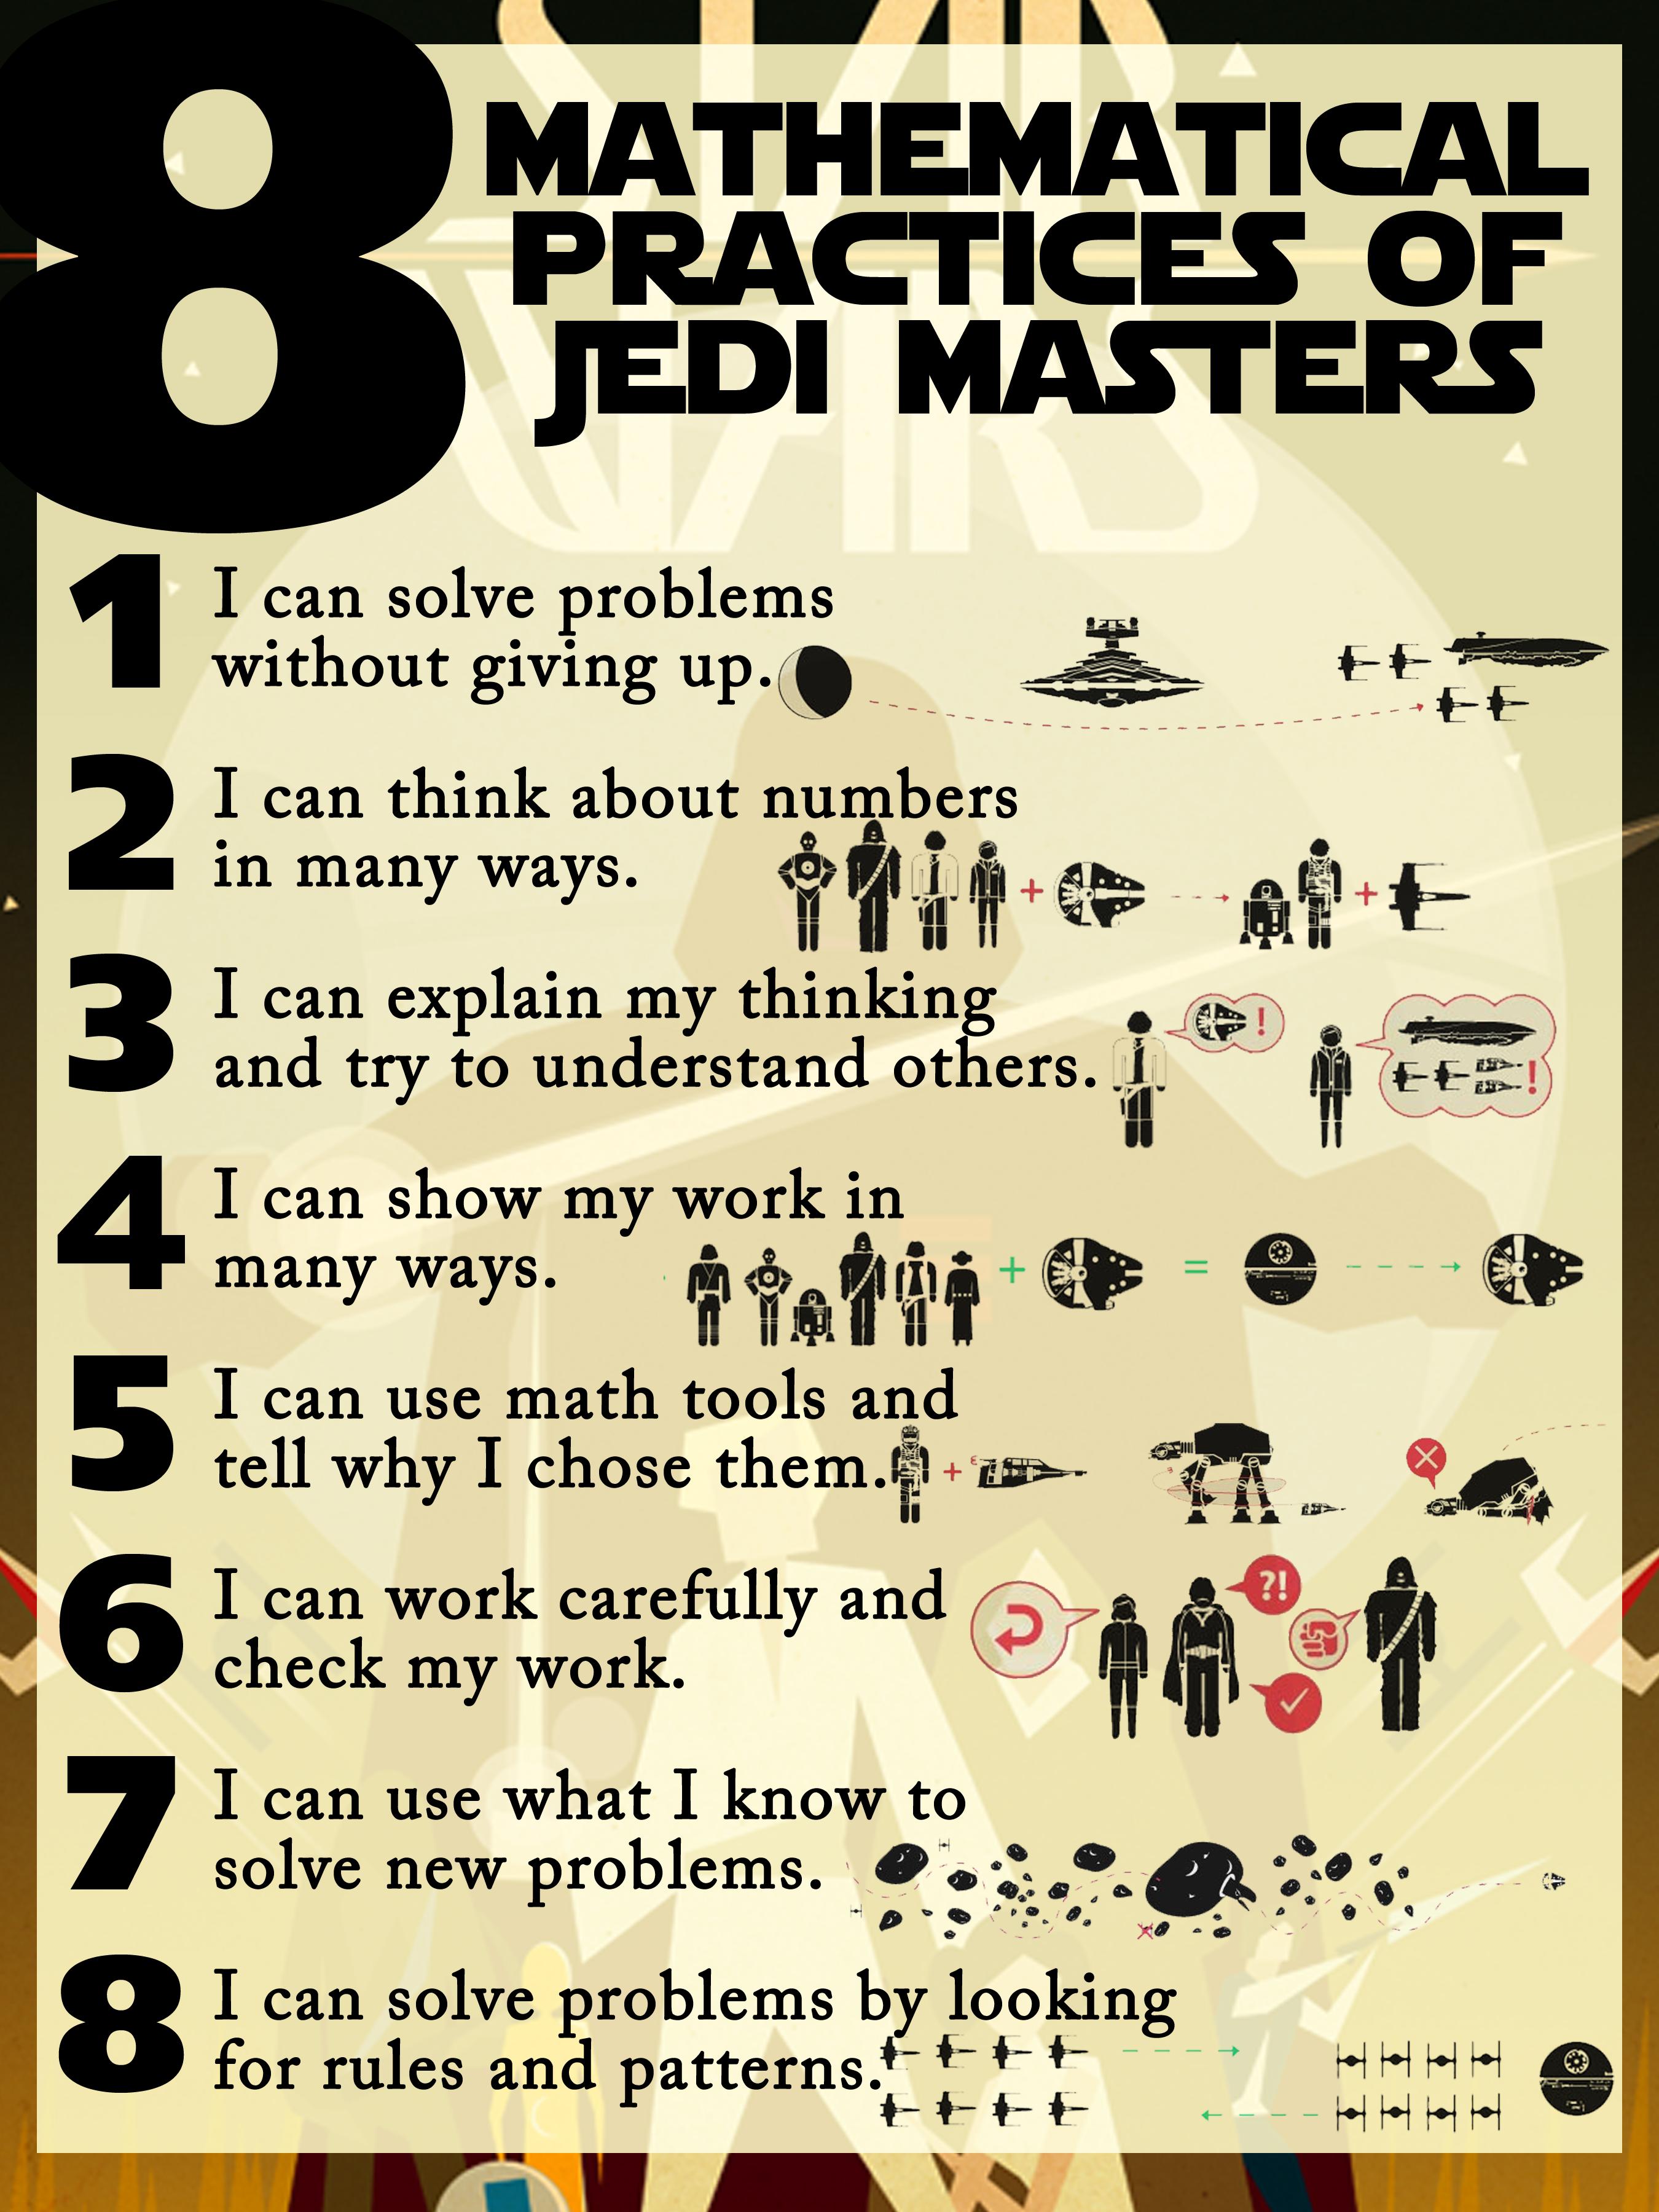 Star Wars Posters Mtbos Msmathchat